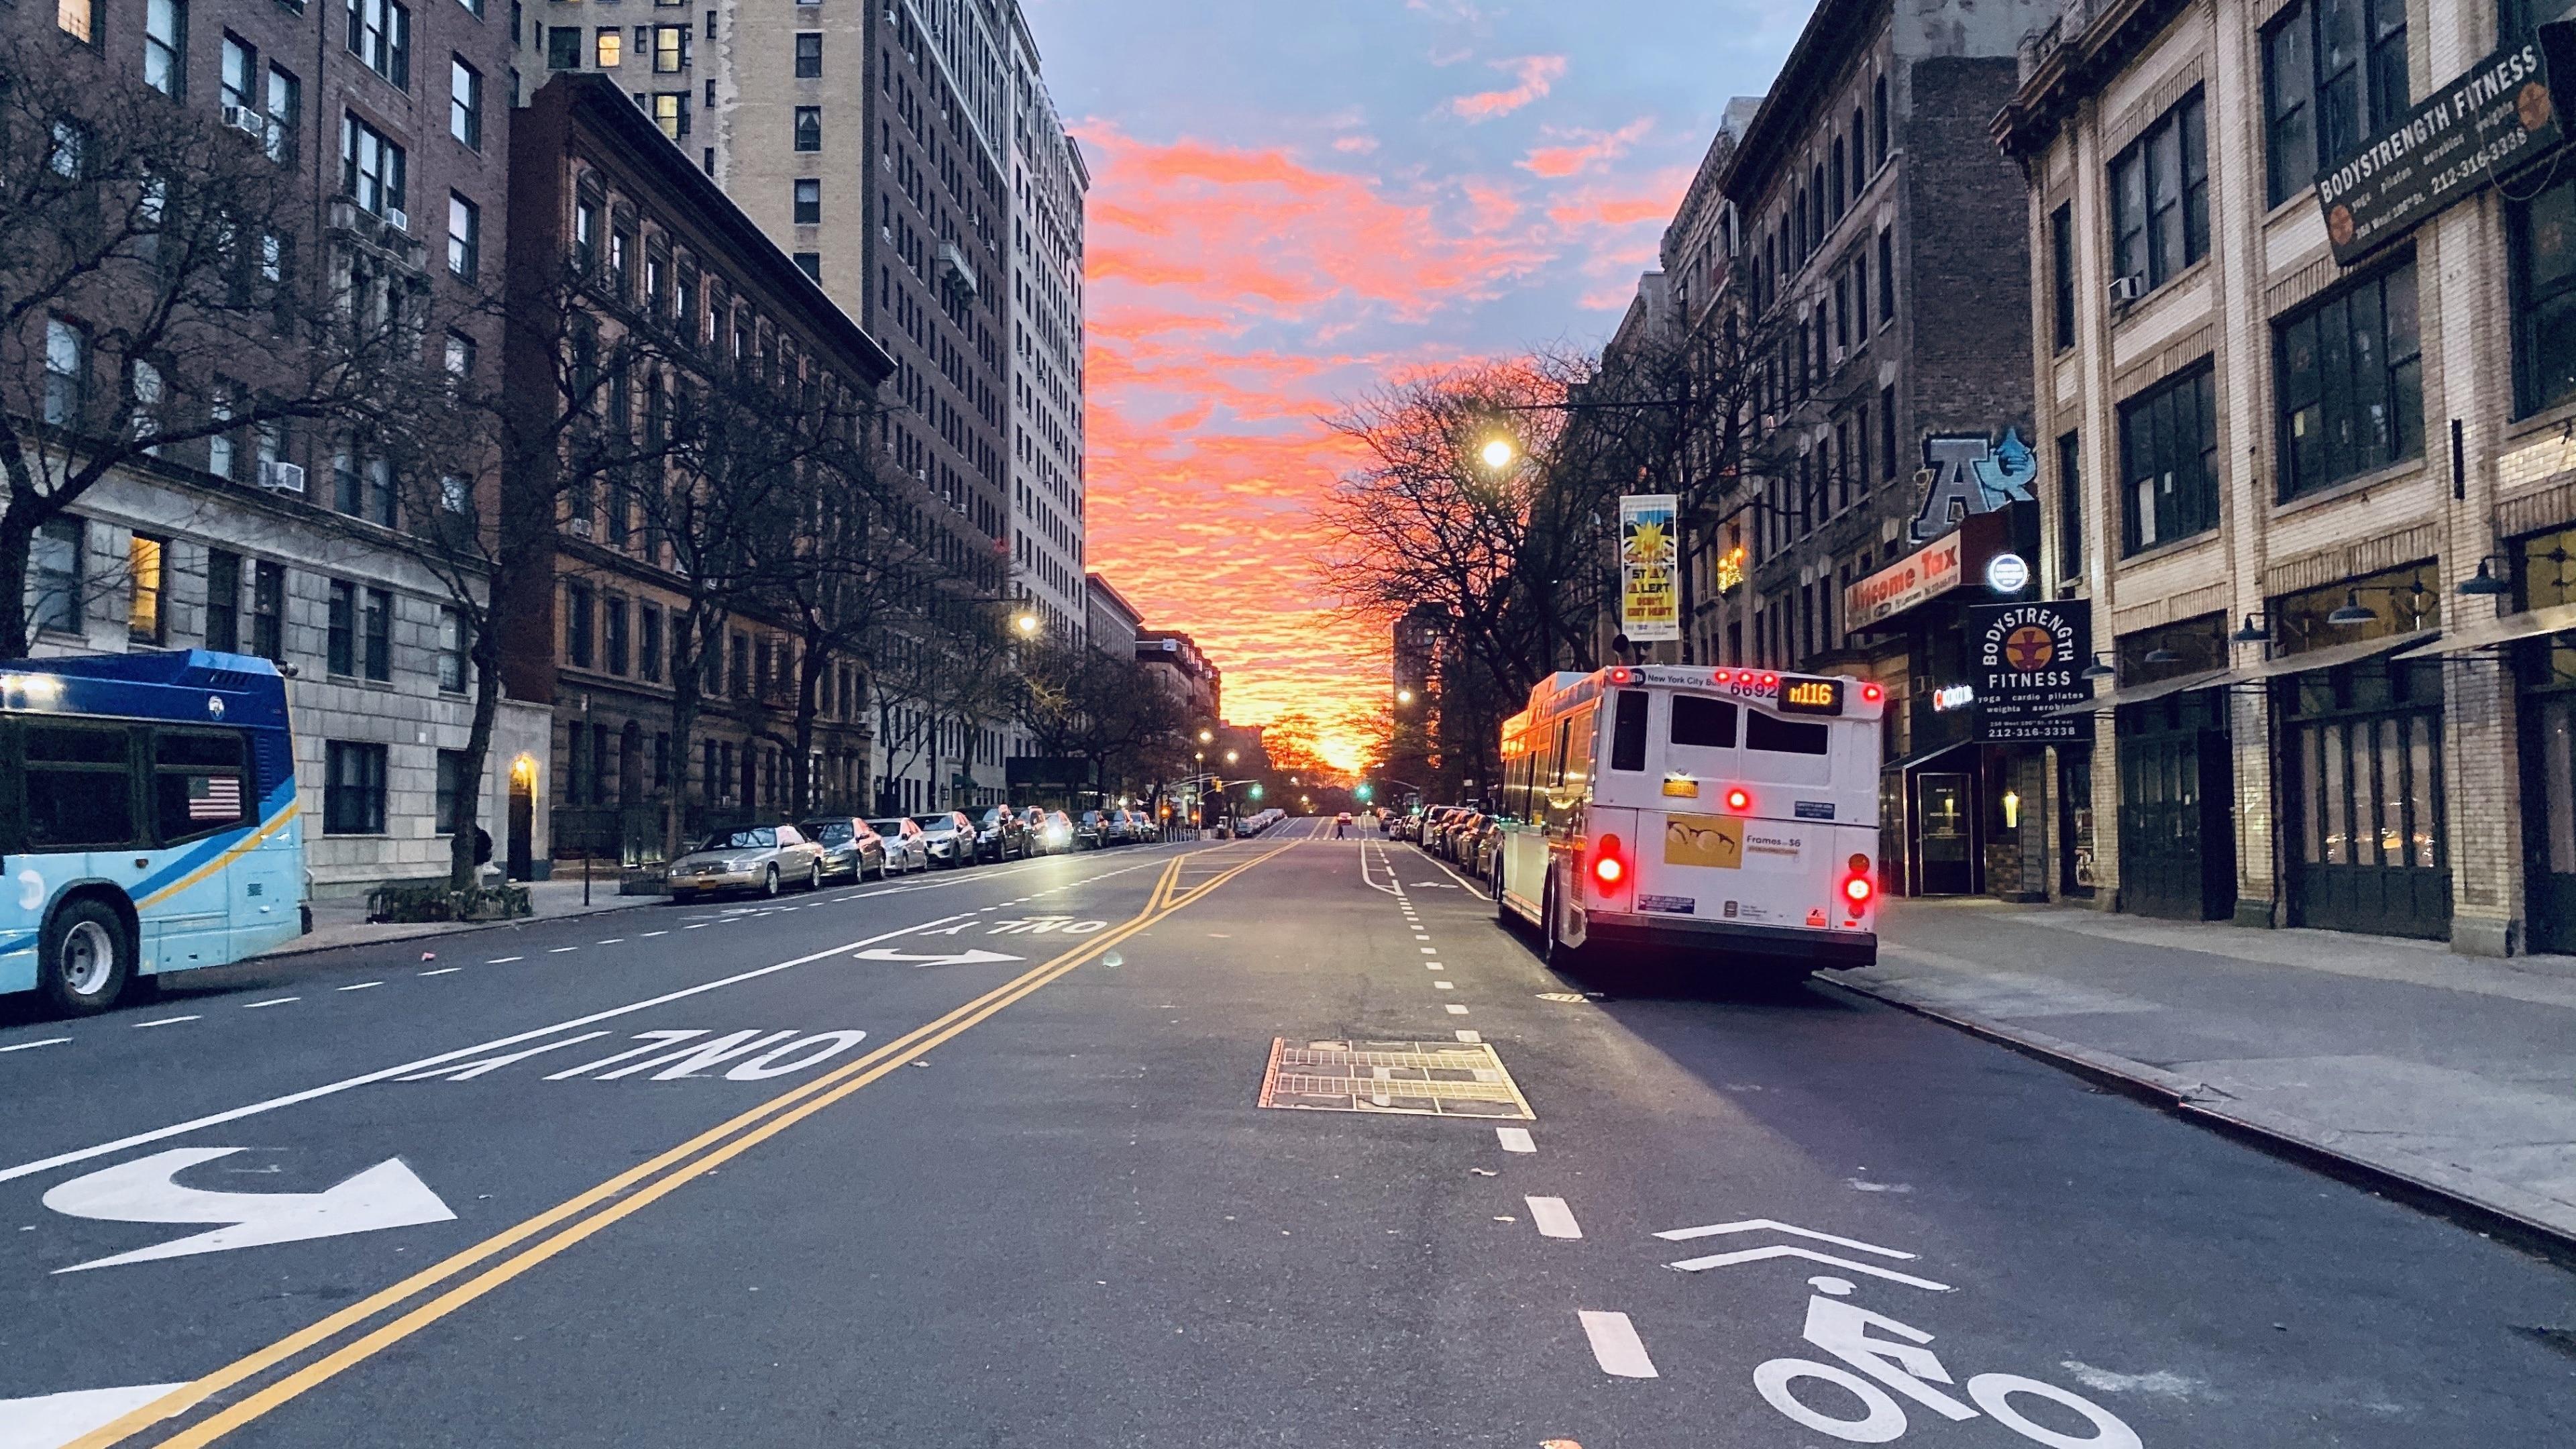 Manhattan Valley, New York, New York, United States of America